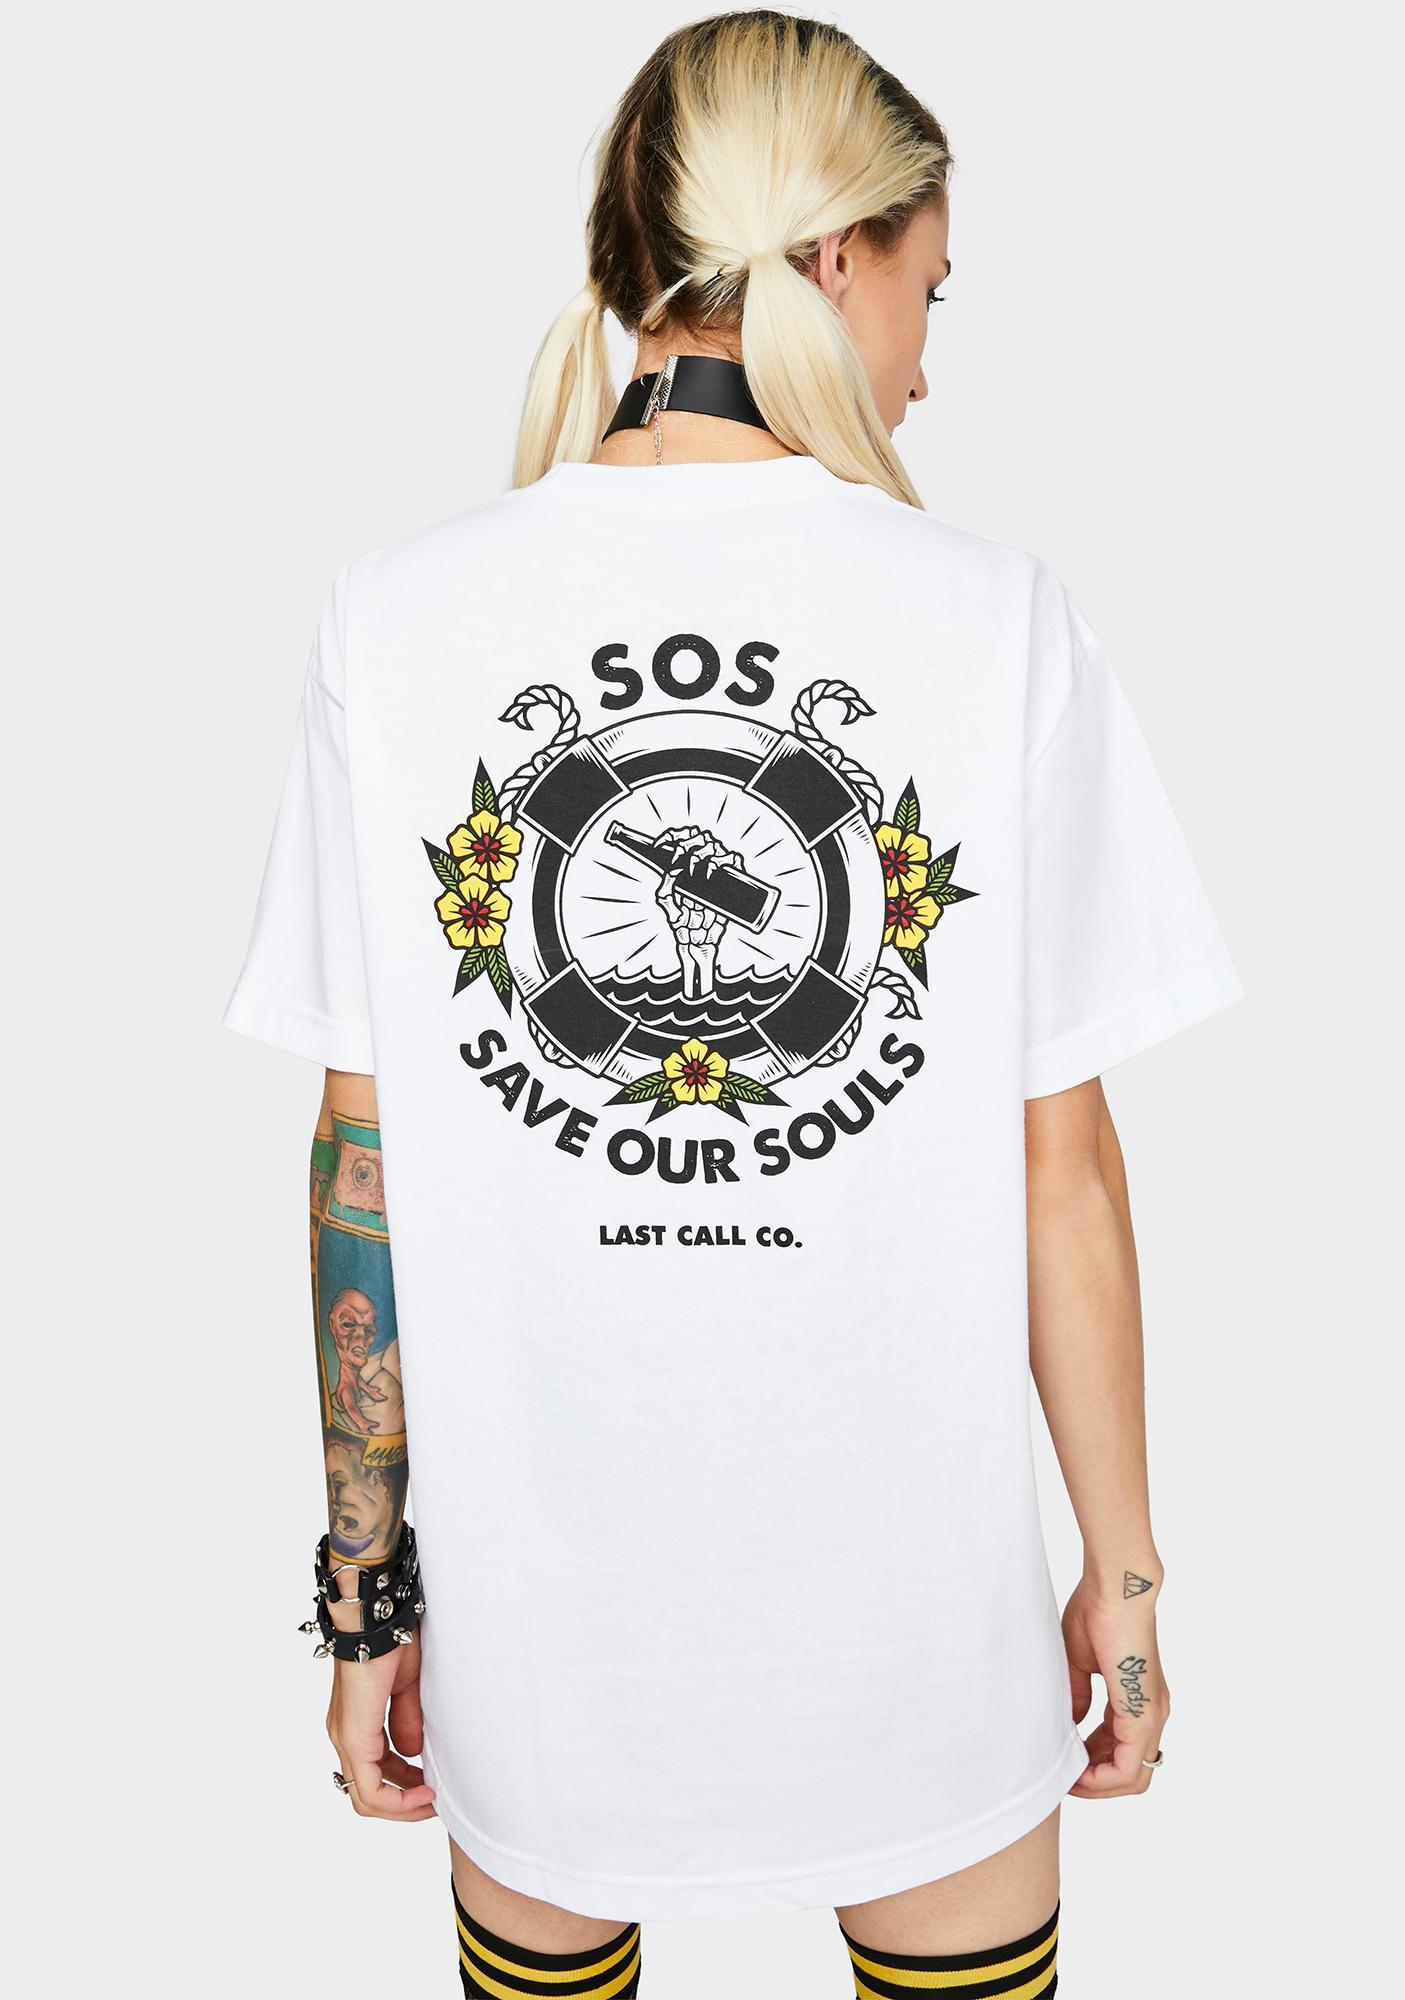 Last Call Co. SOS Graphic Tee